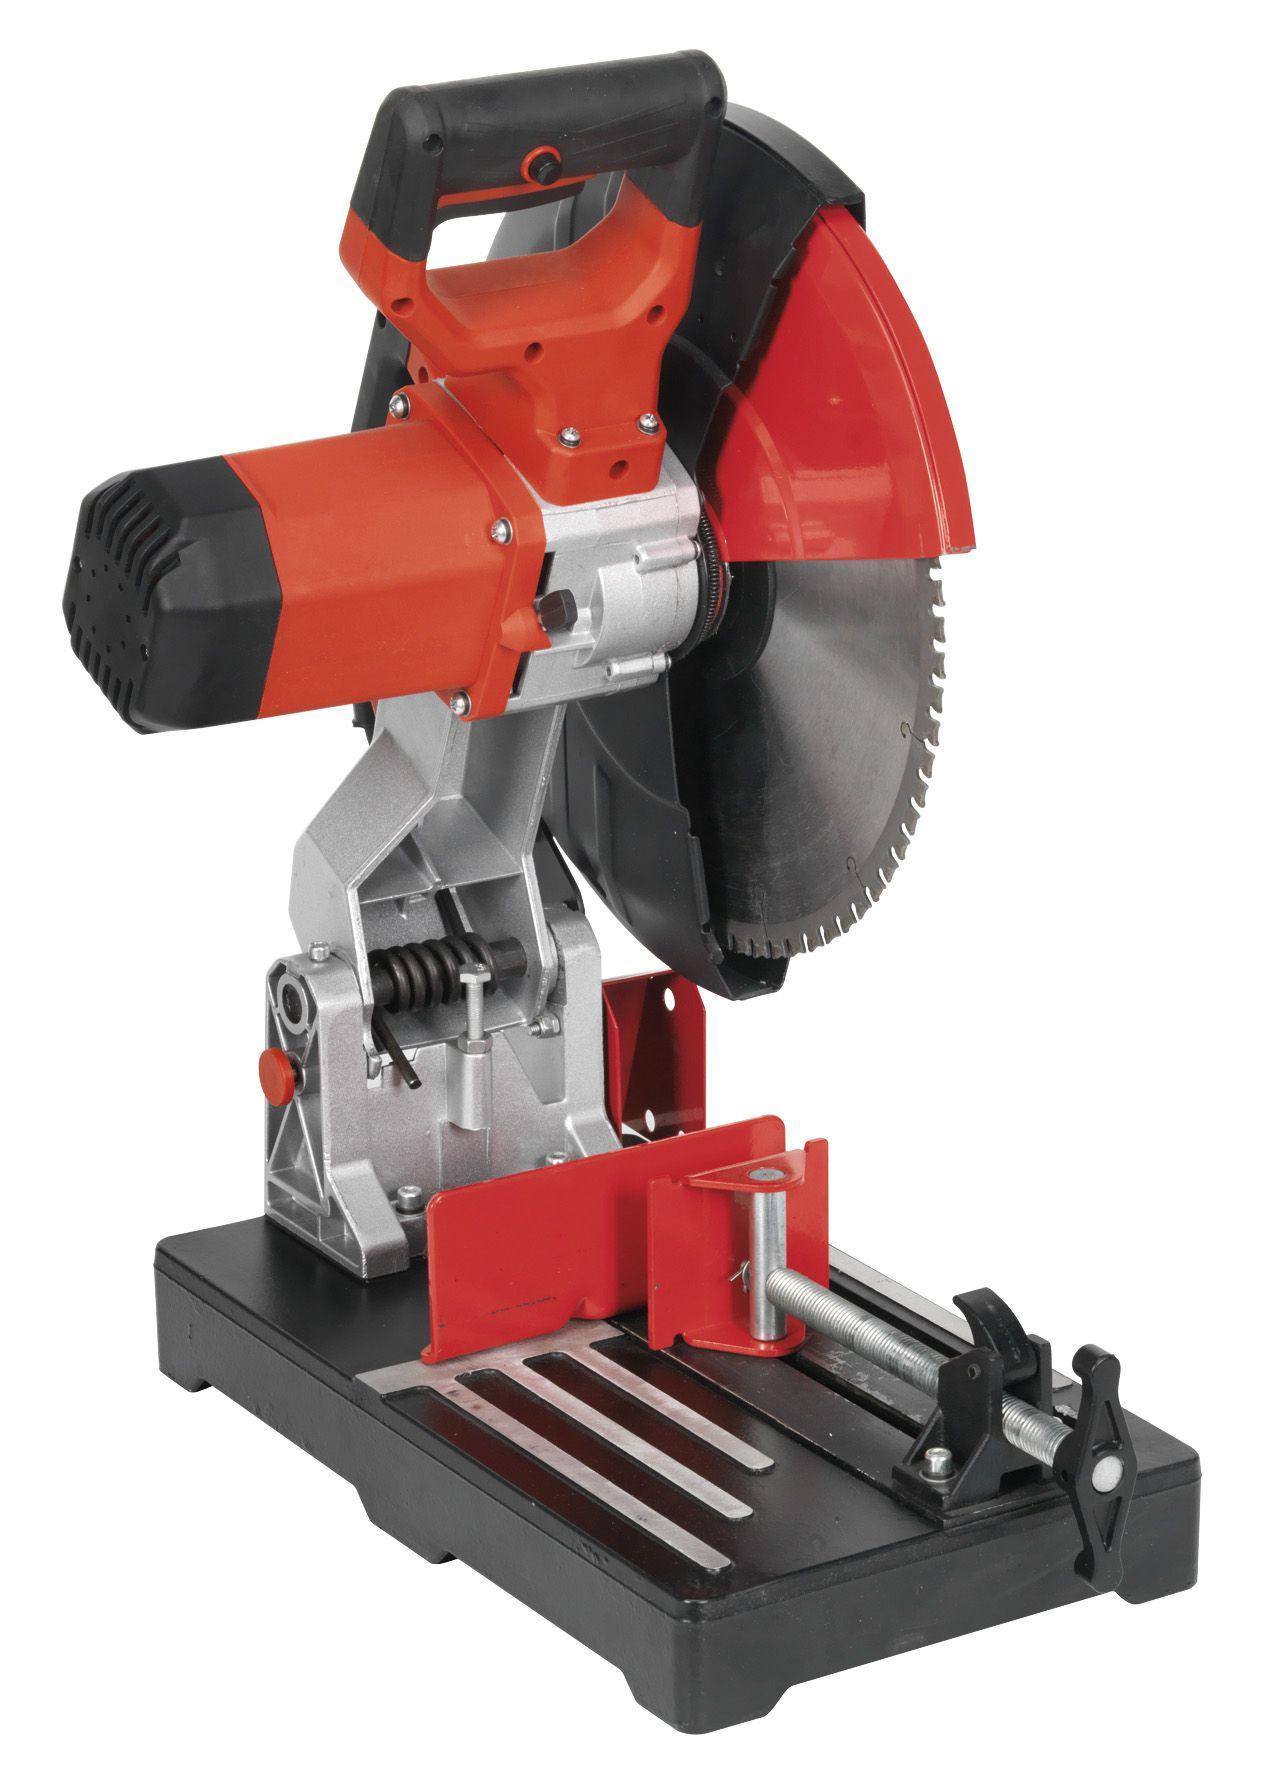 Sealey Cut-Off Machine Ø355mm 230V with Blade